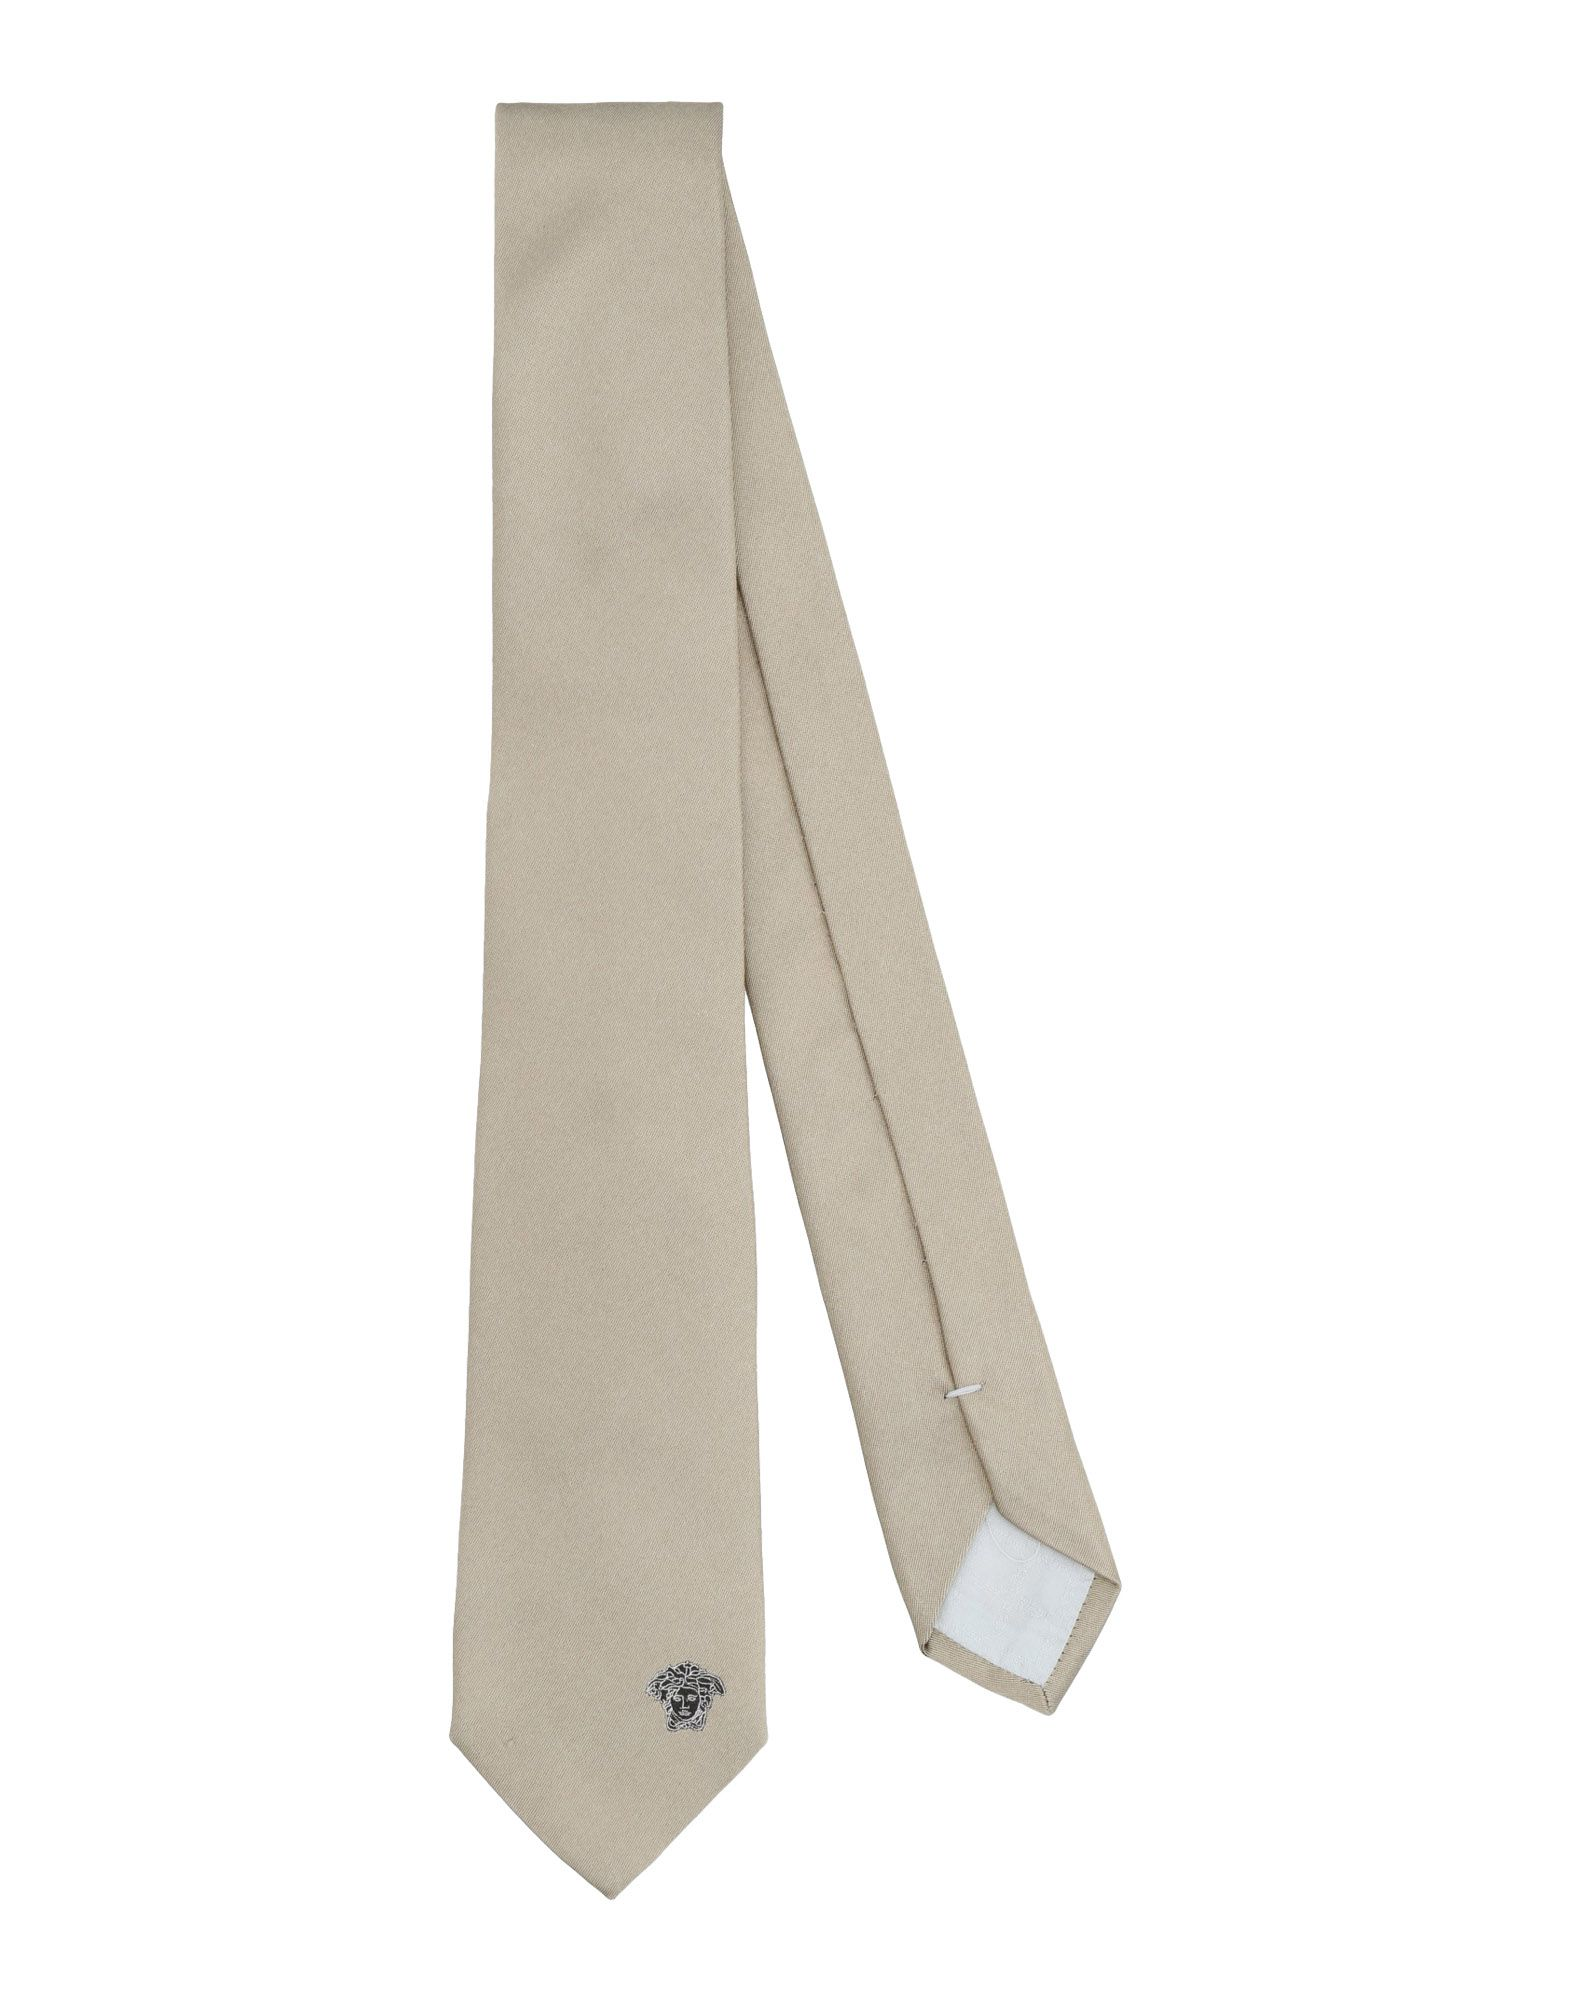 VERSACE Галстук versace бордовый галстук в клетку внизу с логотипом versace 821752 href